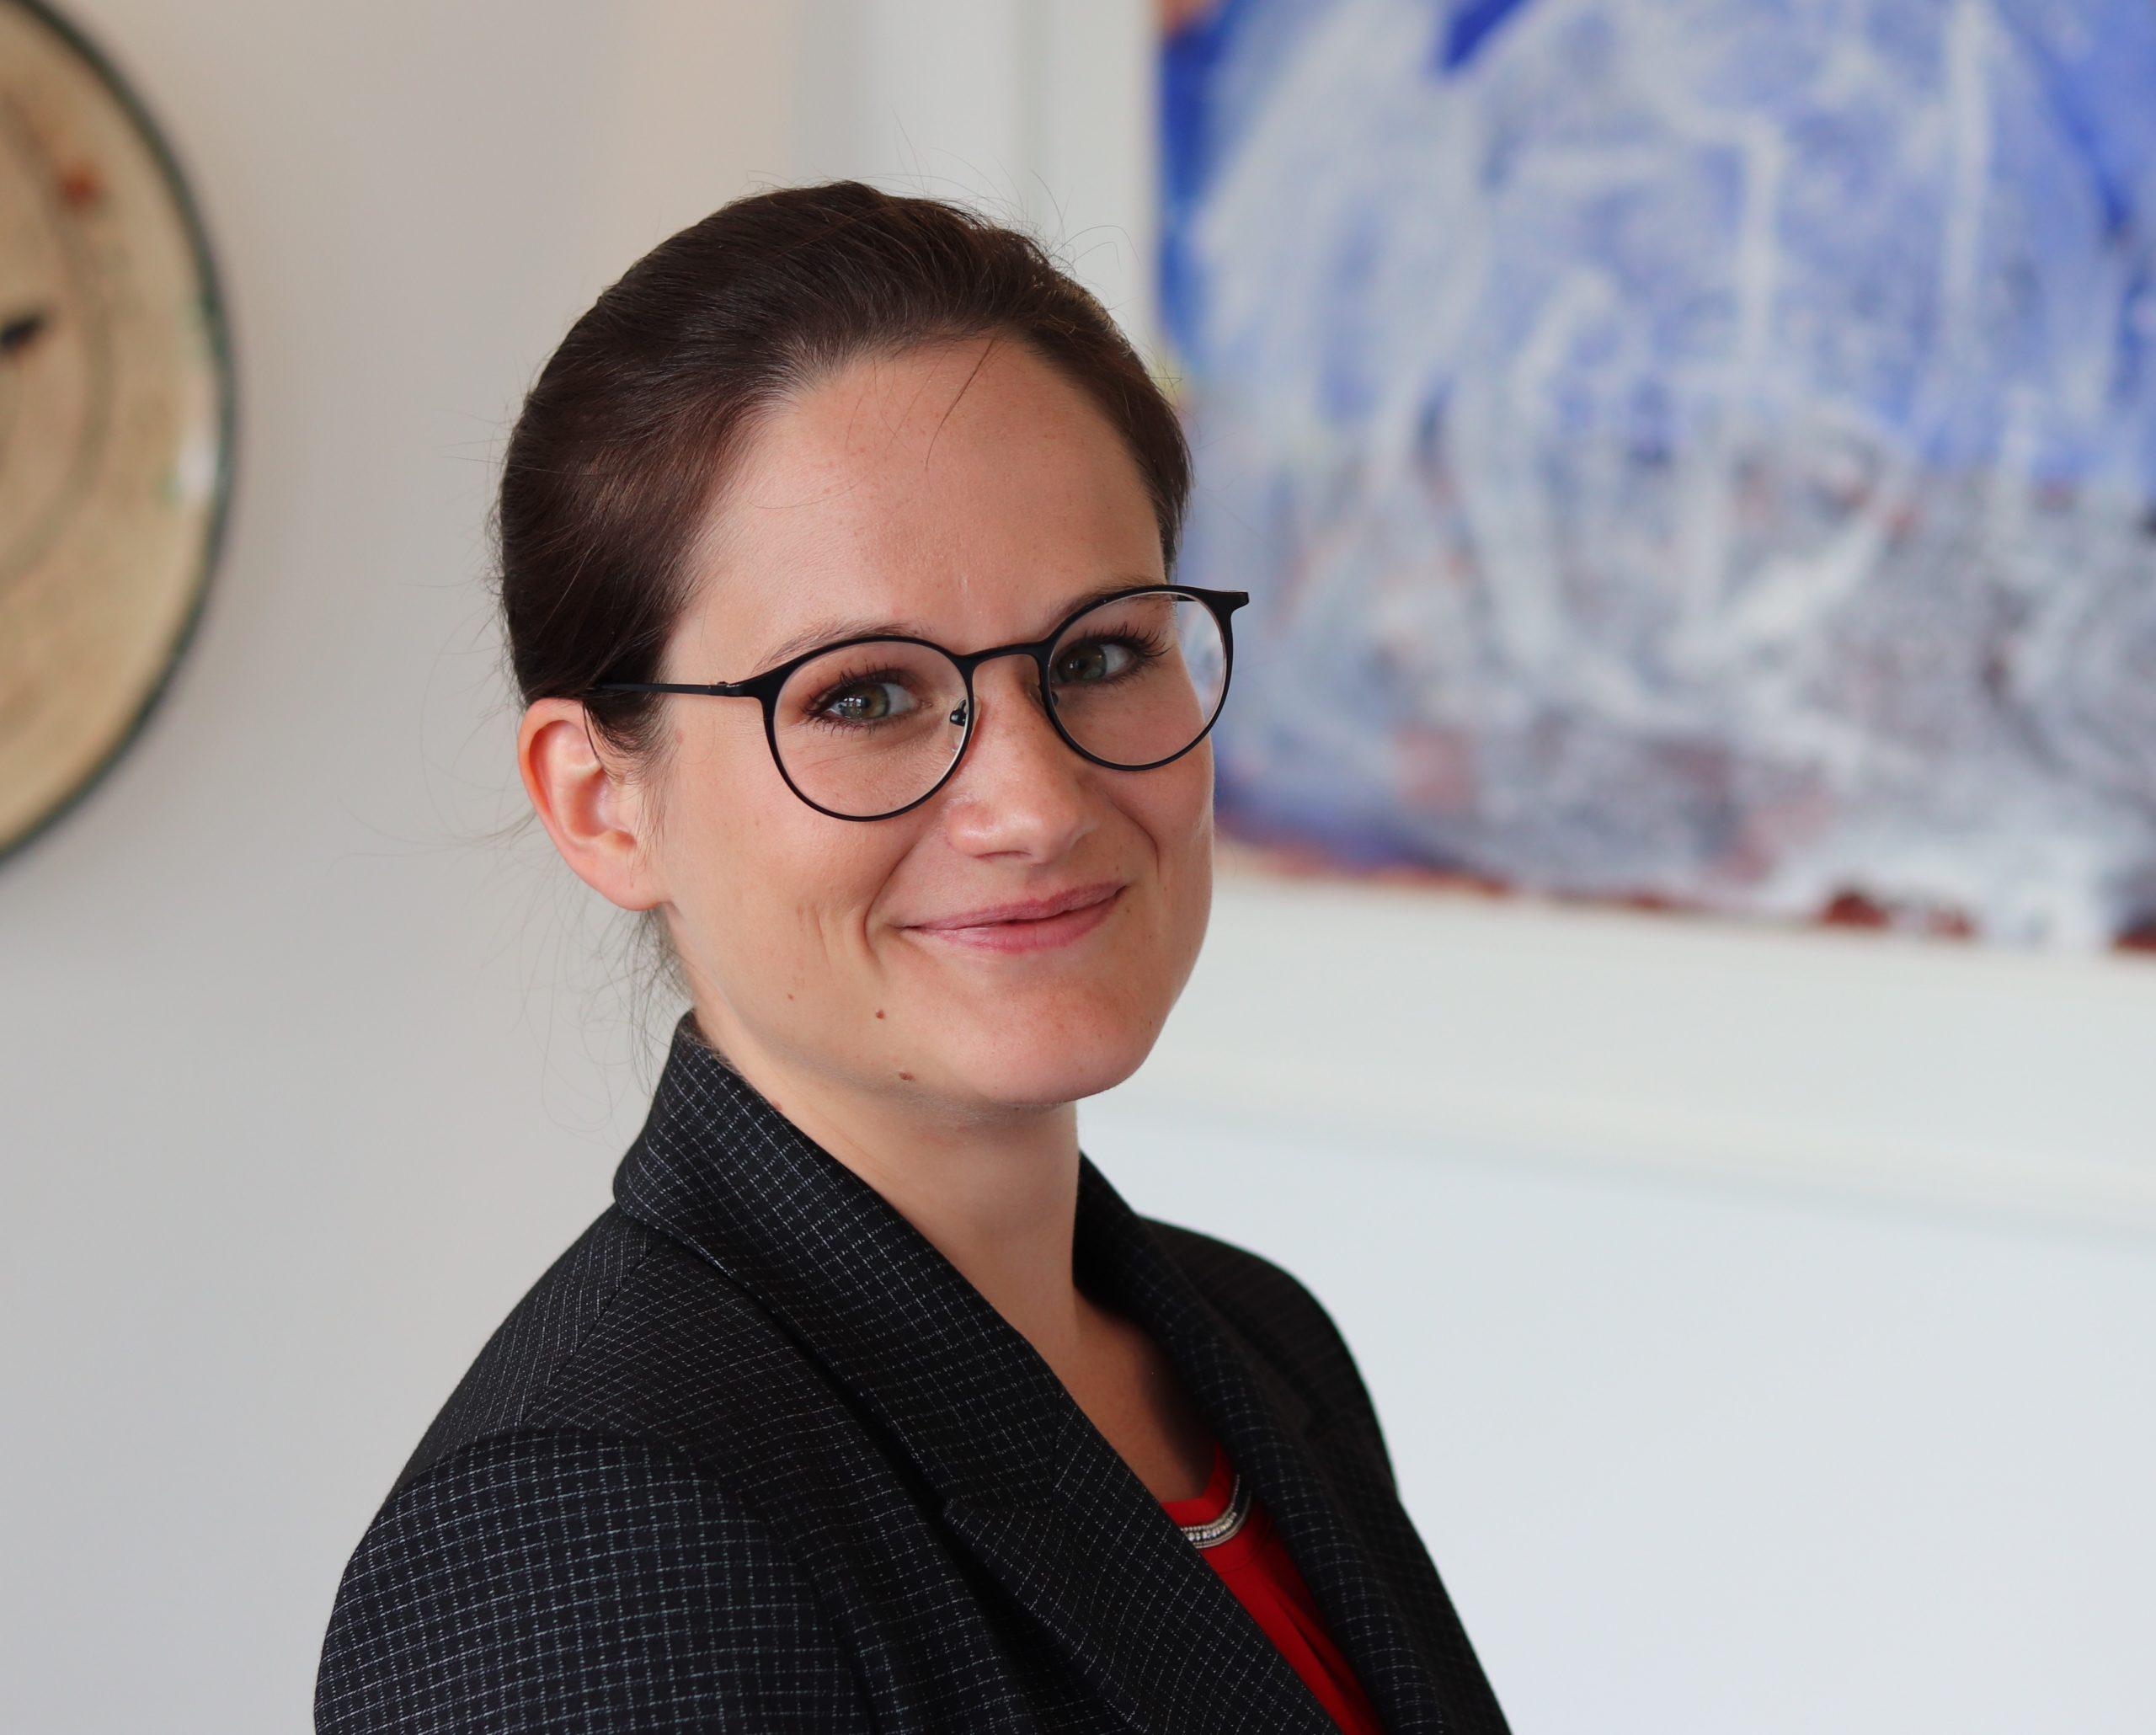 Sophia Gerlach